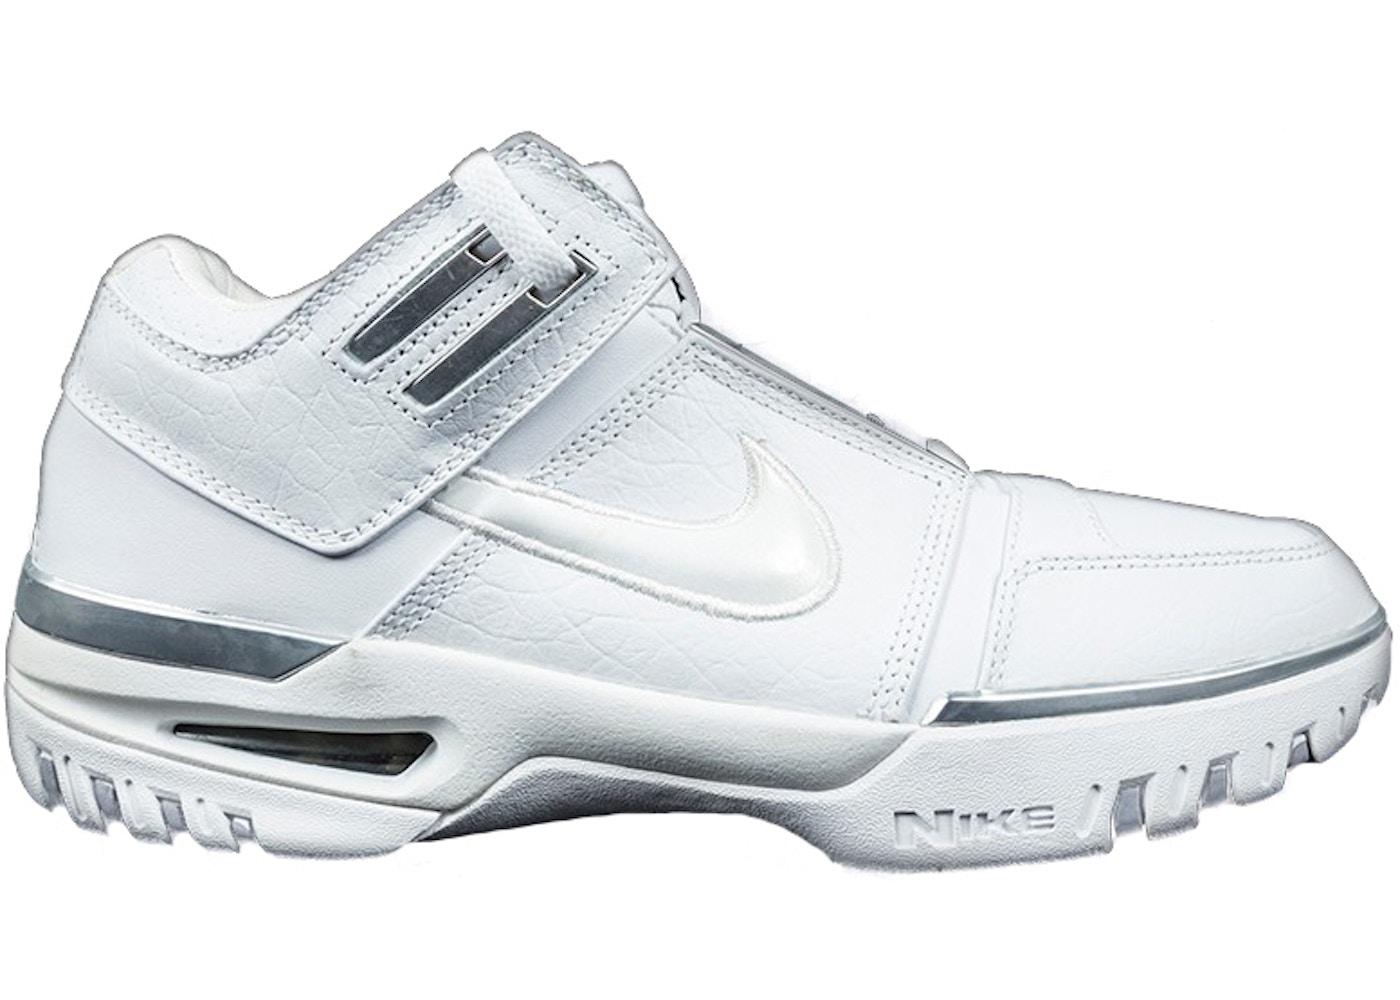 855c730304bb Buy Nike LeBron 1 Shoes   Deadstock Sneakers